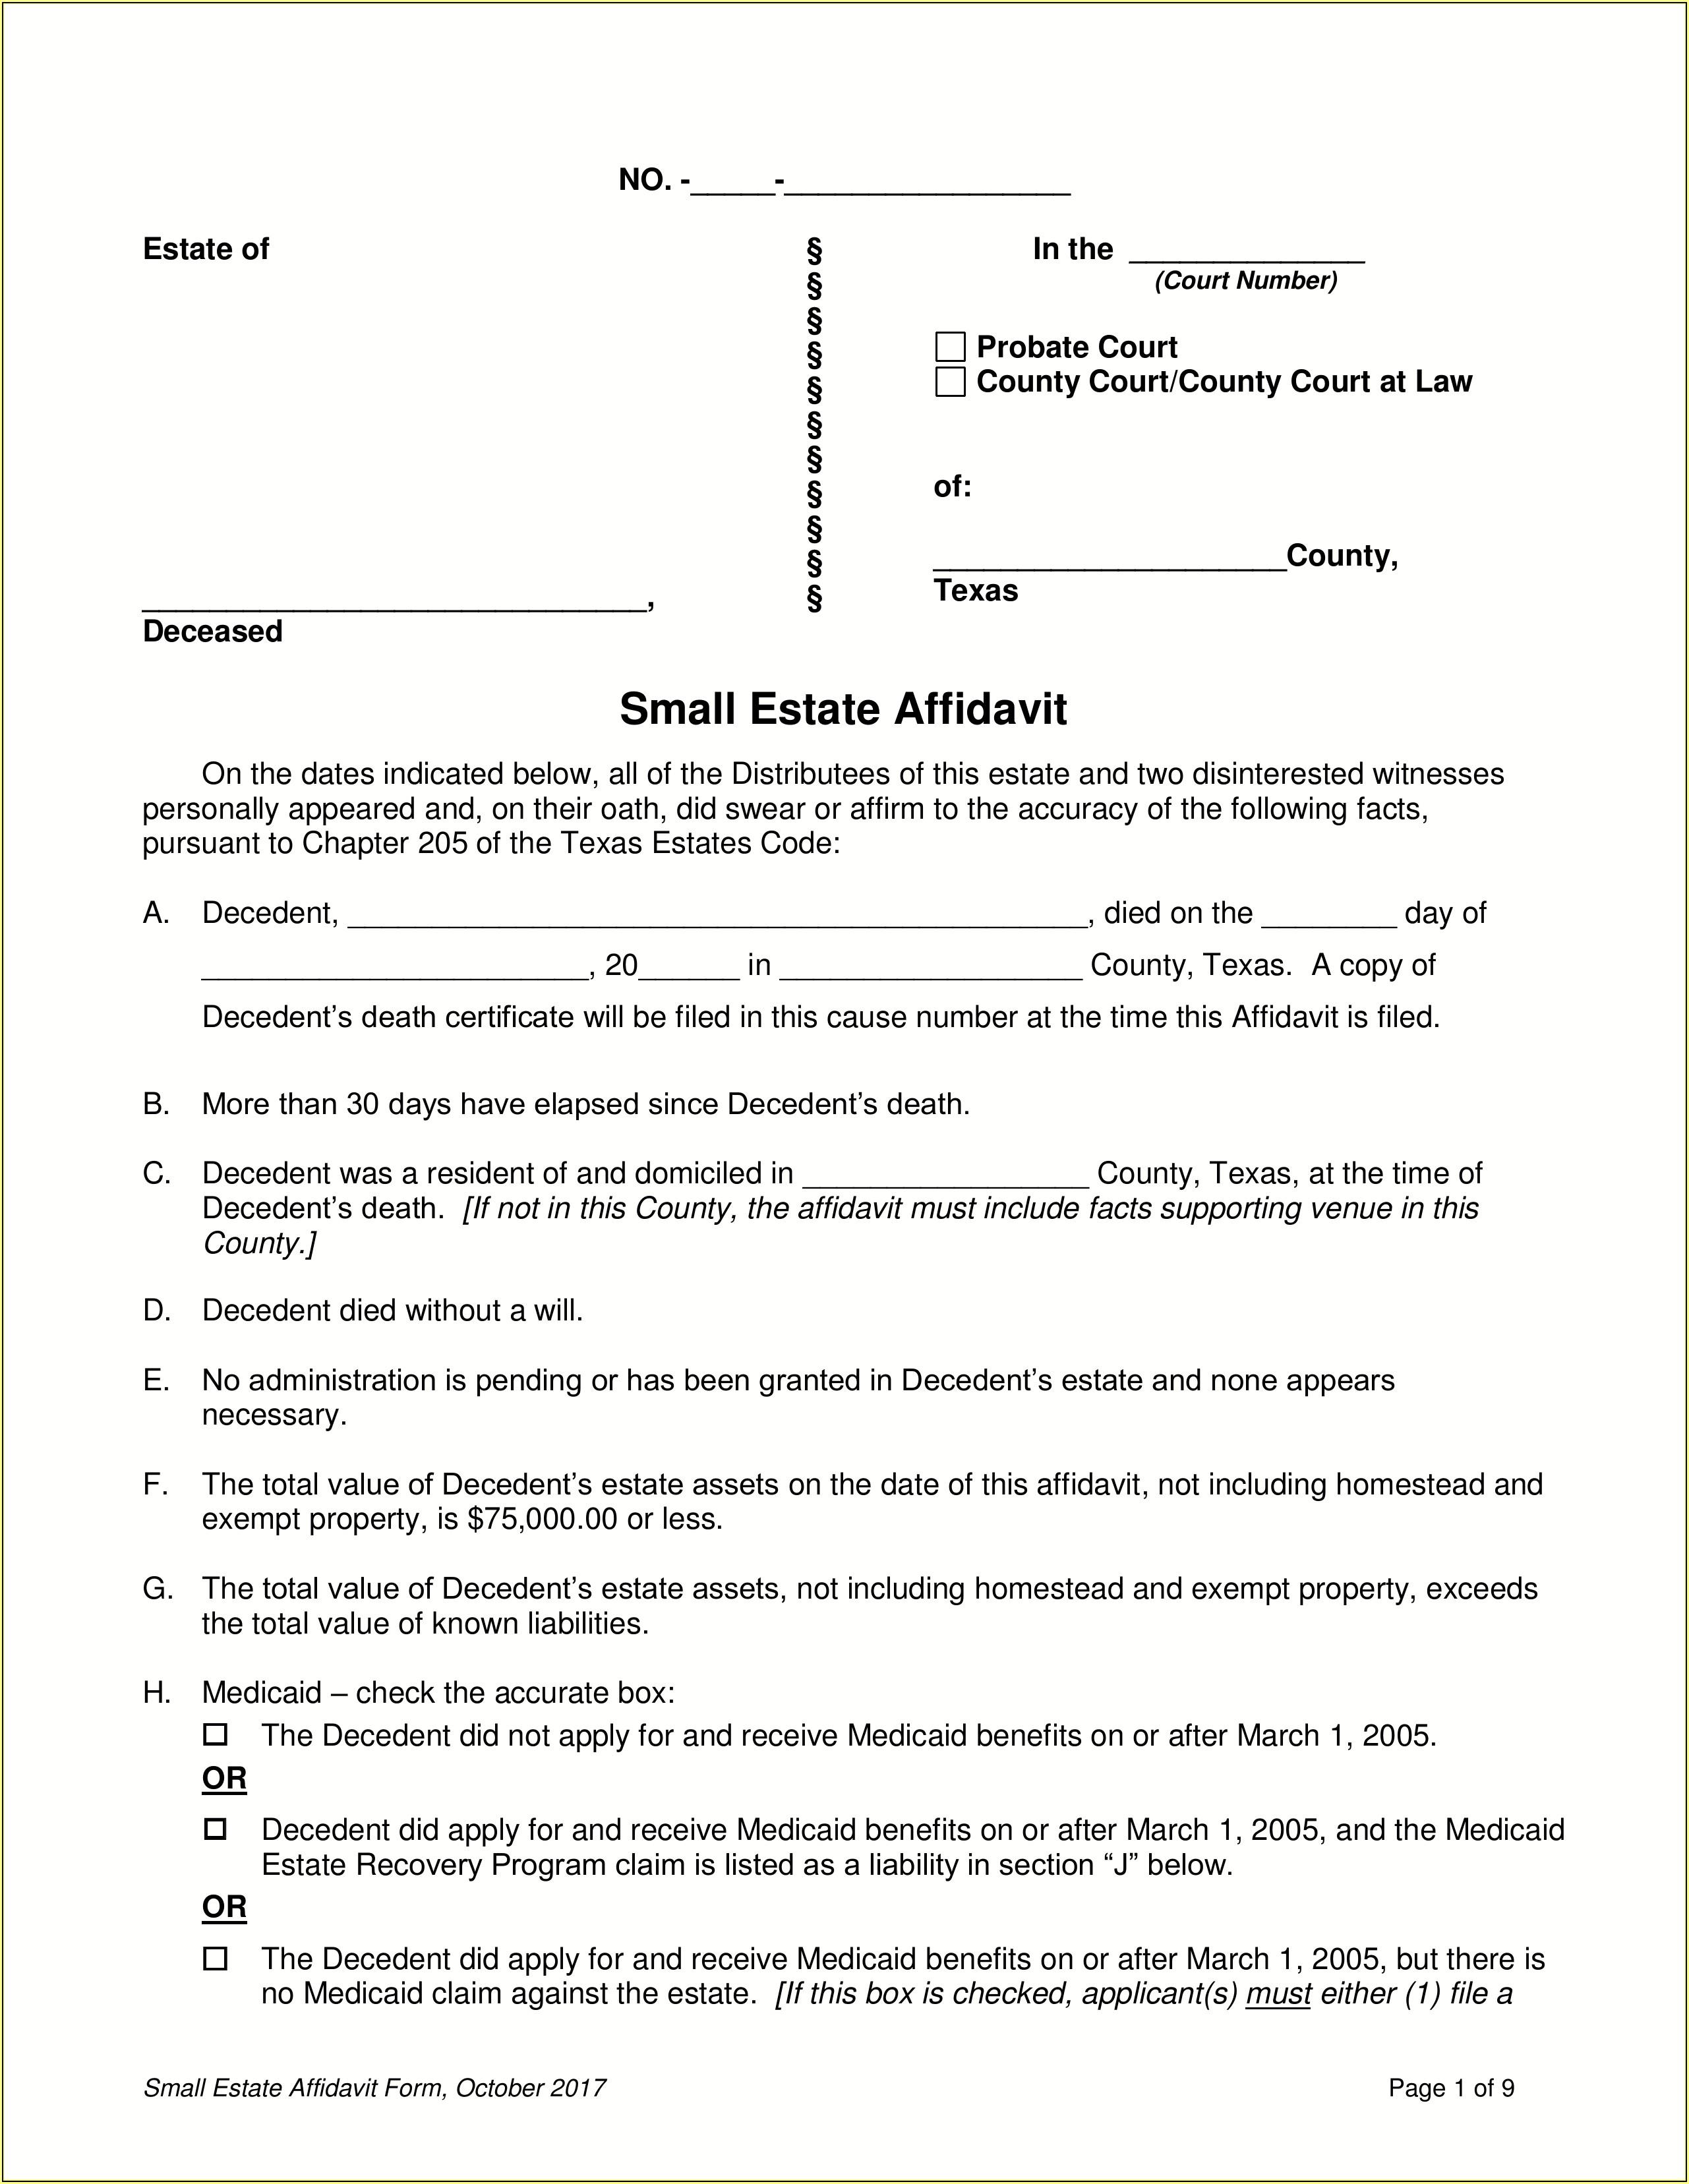 Small Estate Affidavit Form Tarrant County Texas